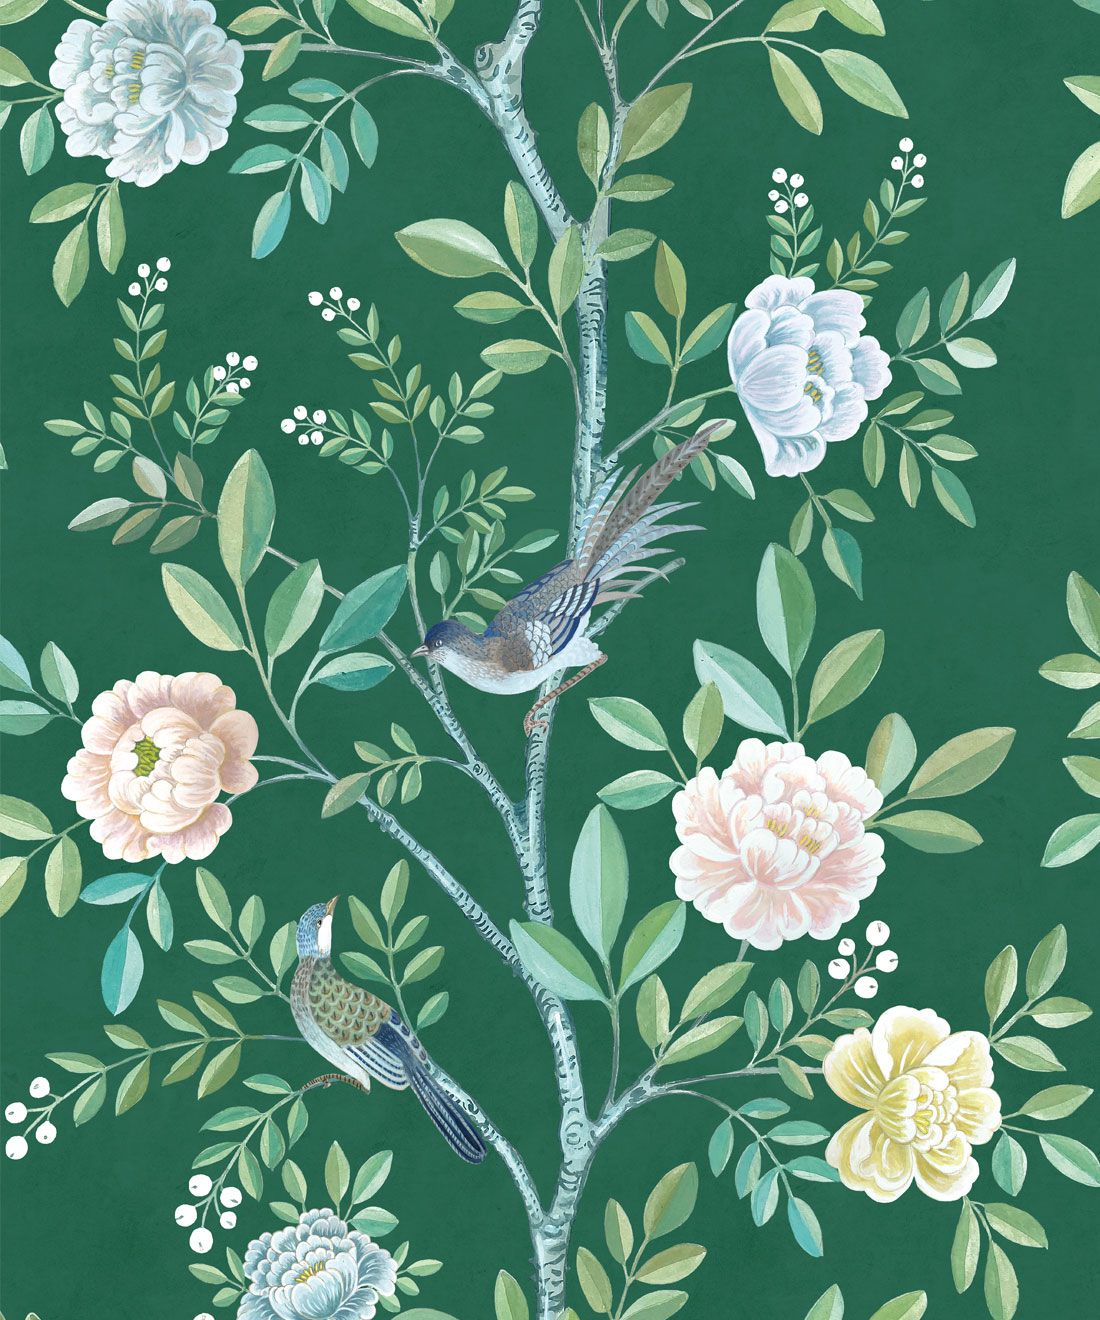 Chinoiserie Wallpaper •Floral Wallpaper •Bird Wallpaper • Magnolia • Emerald Green • Swatch